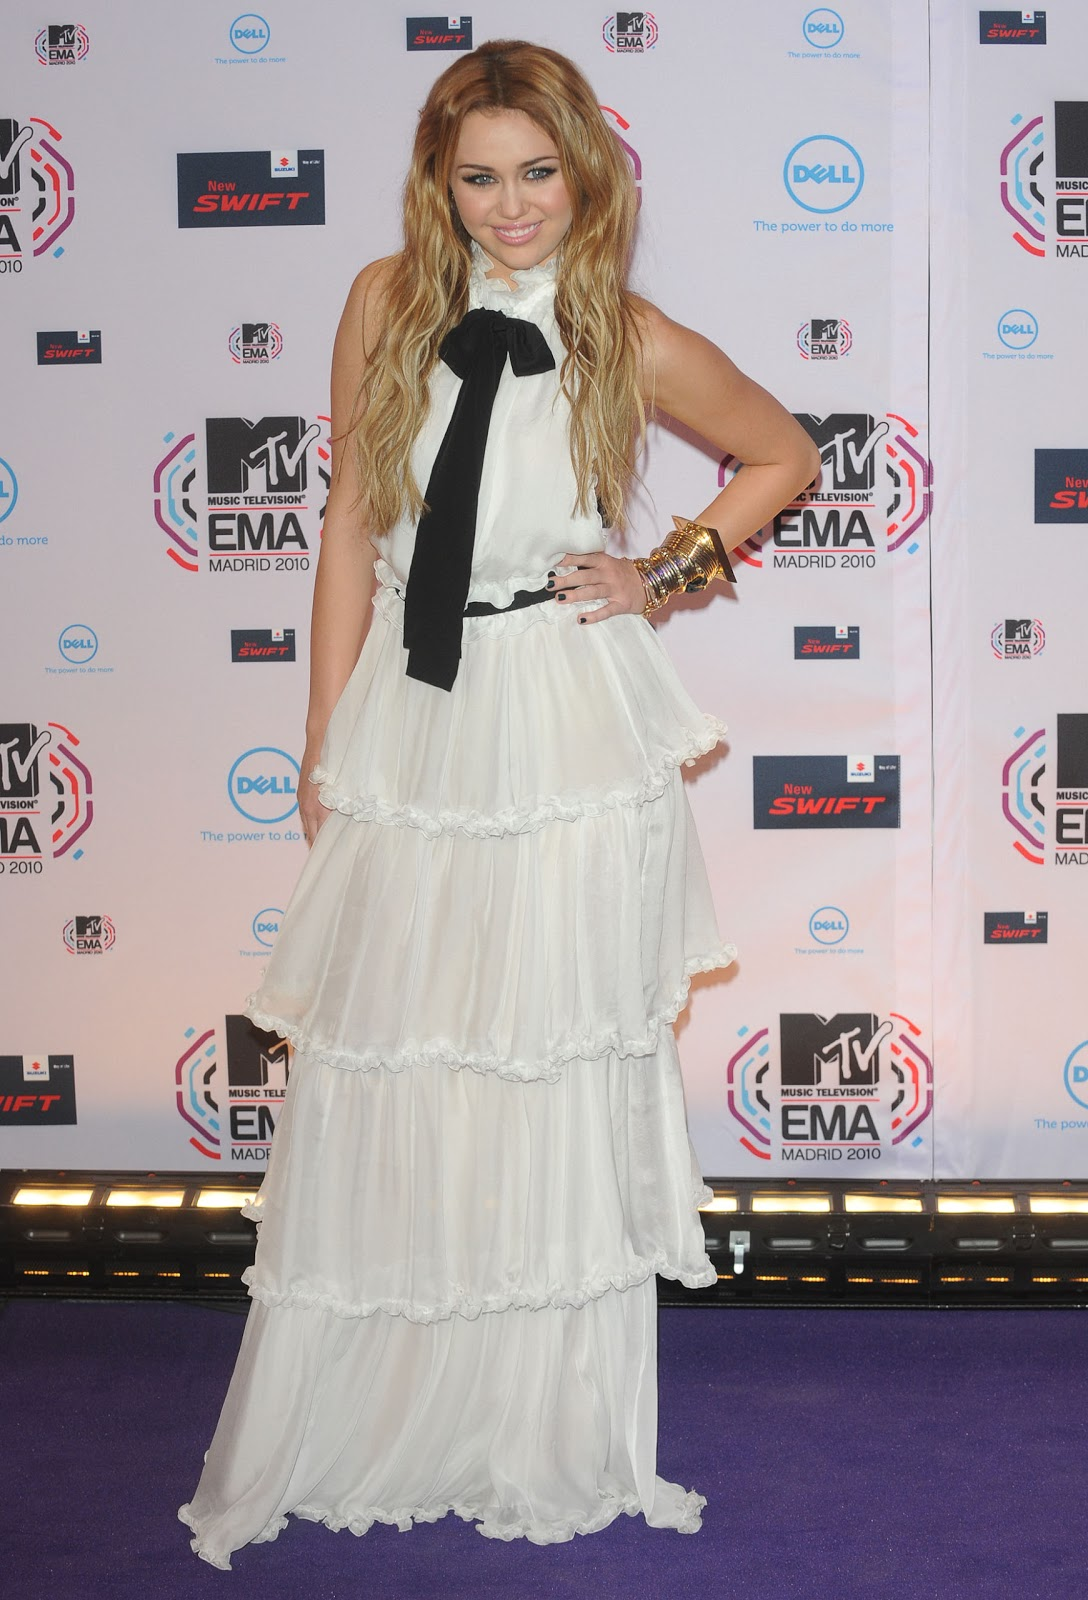 http://4.bp.blogspot.com/-Q0k1tpw6y6w/ThEsRVFXJ2I/AAAAAAAACHA/64NfwvmD27c/s1600/Miley-Cyrus_COM_MTVEMAs_MadridSpain_7Nov2010_064.jpg